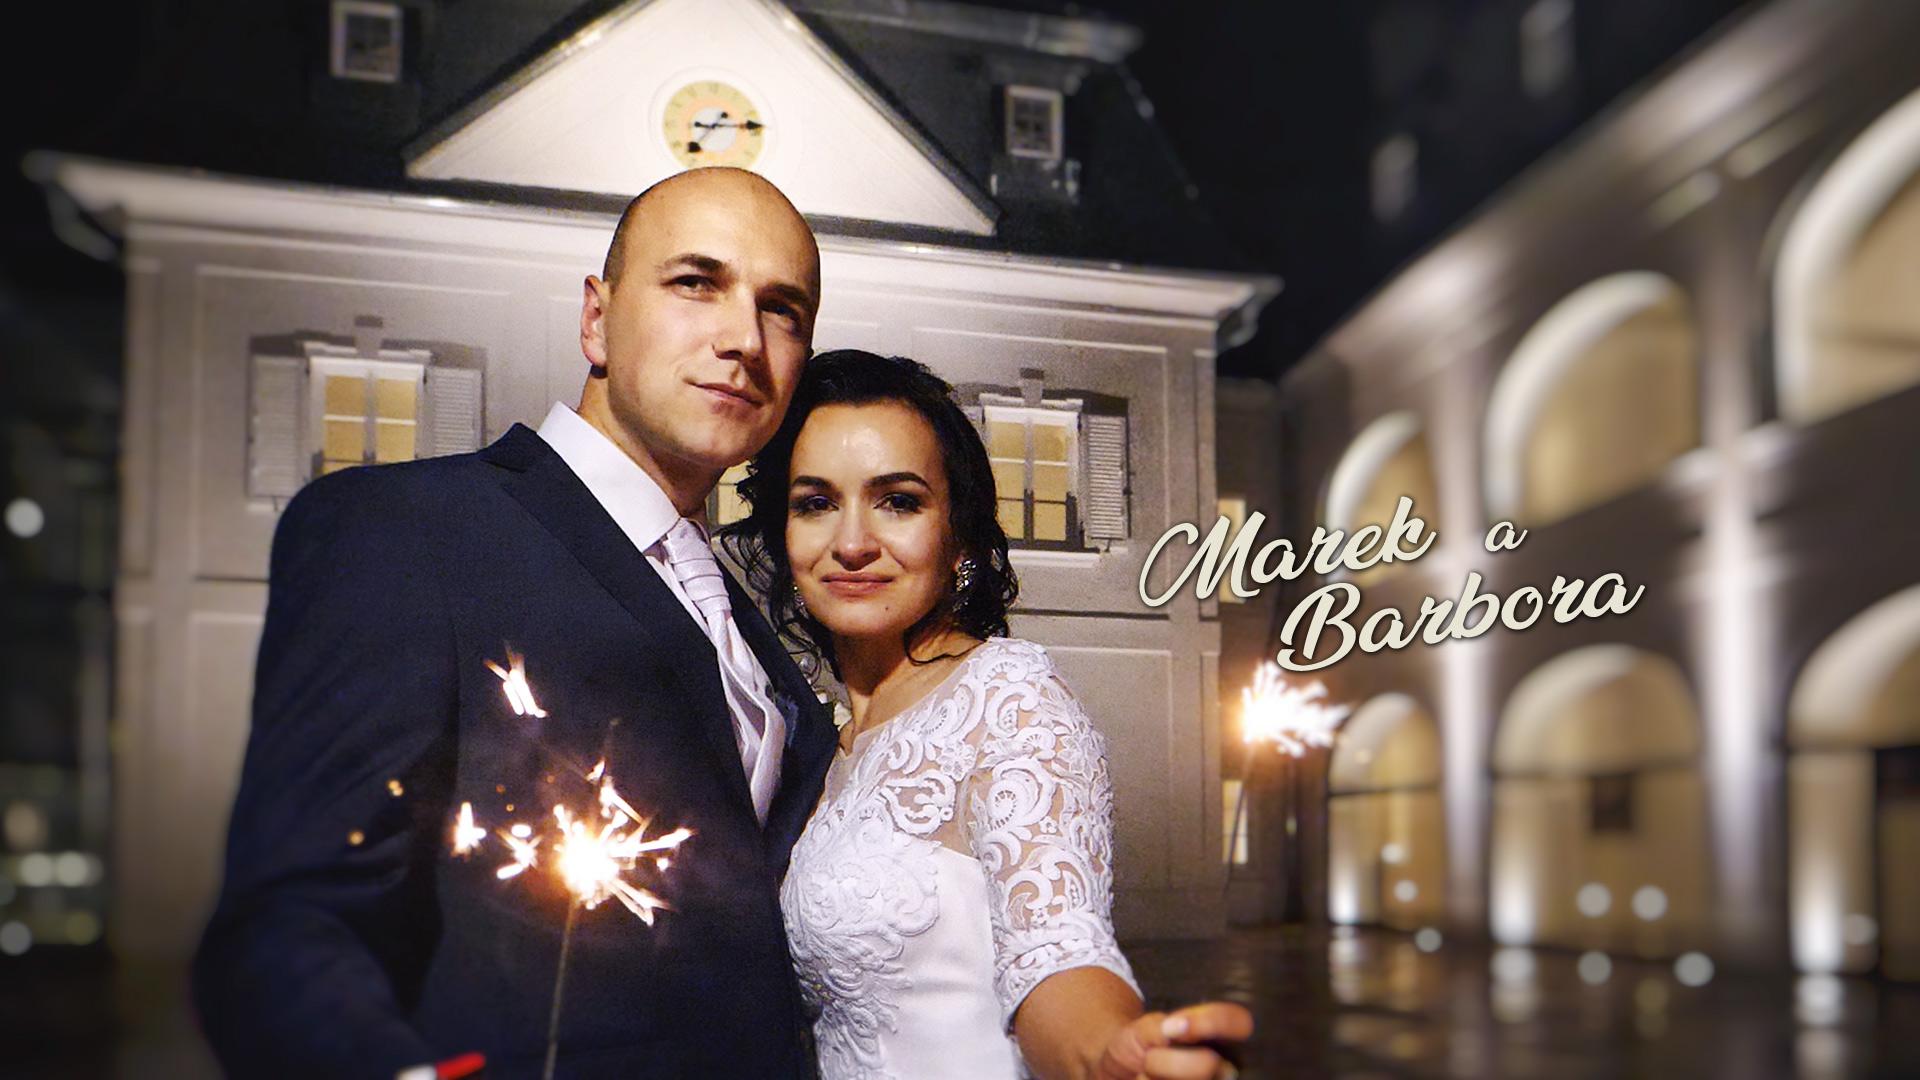 Svadba Marek a Barbora